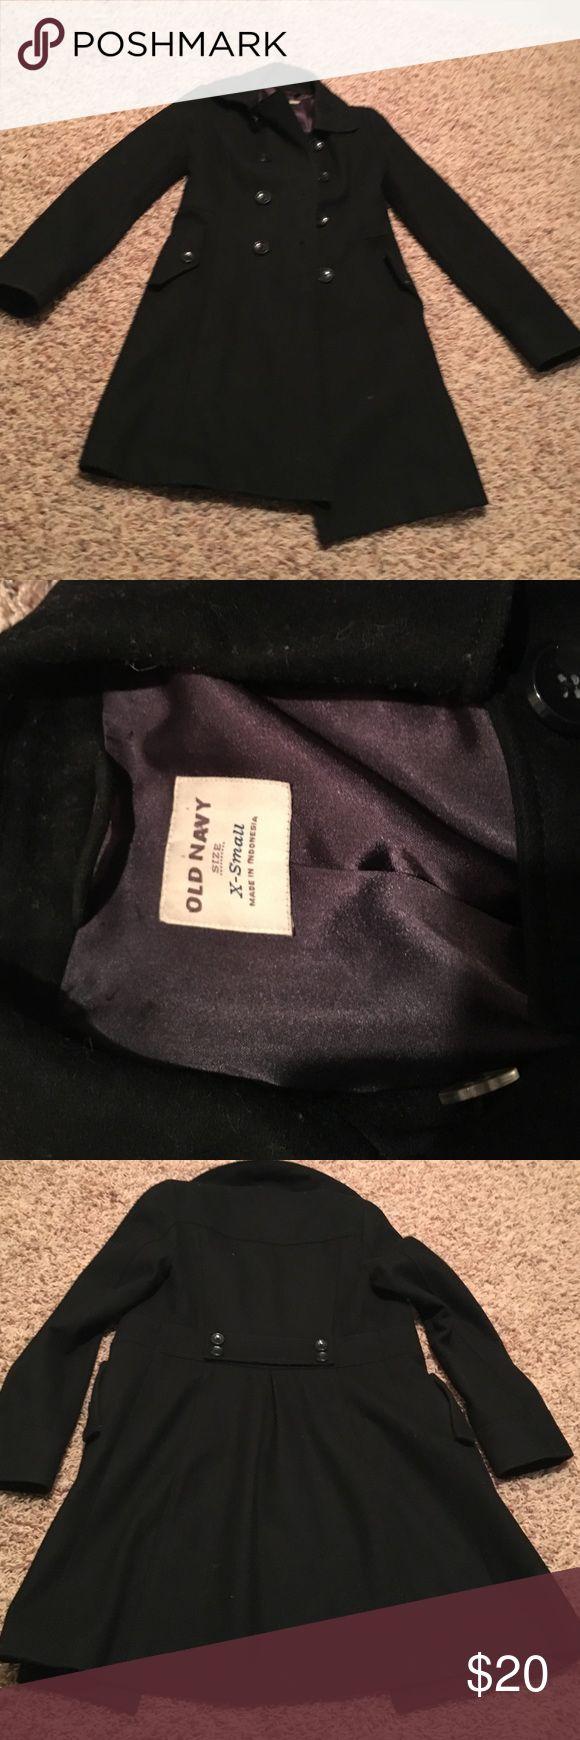 🚨FINAL SALE. Old Navy Pea Coat. Black. Old Navy peacoat. Black. Fair condition. Size X small. Old Navy Jackets & Coats Pea Coats